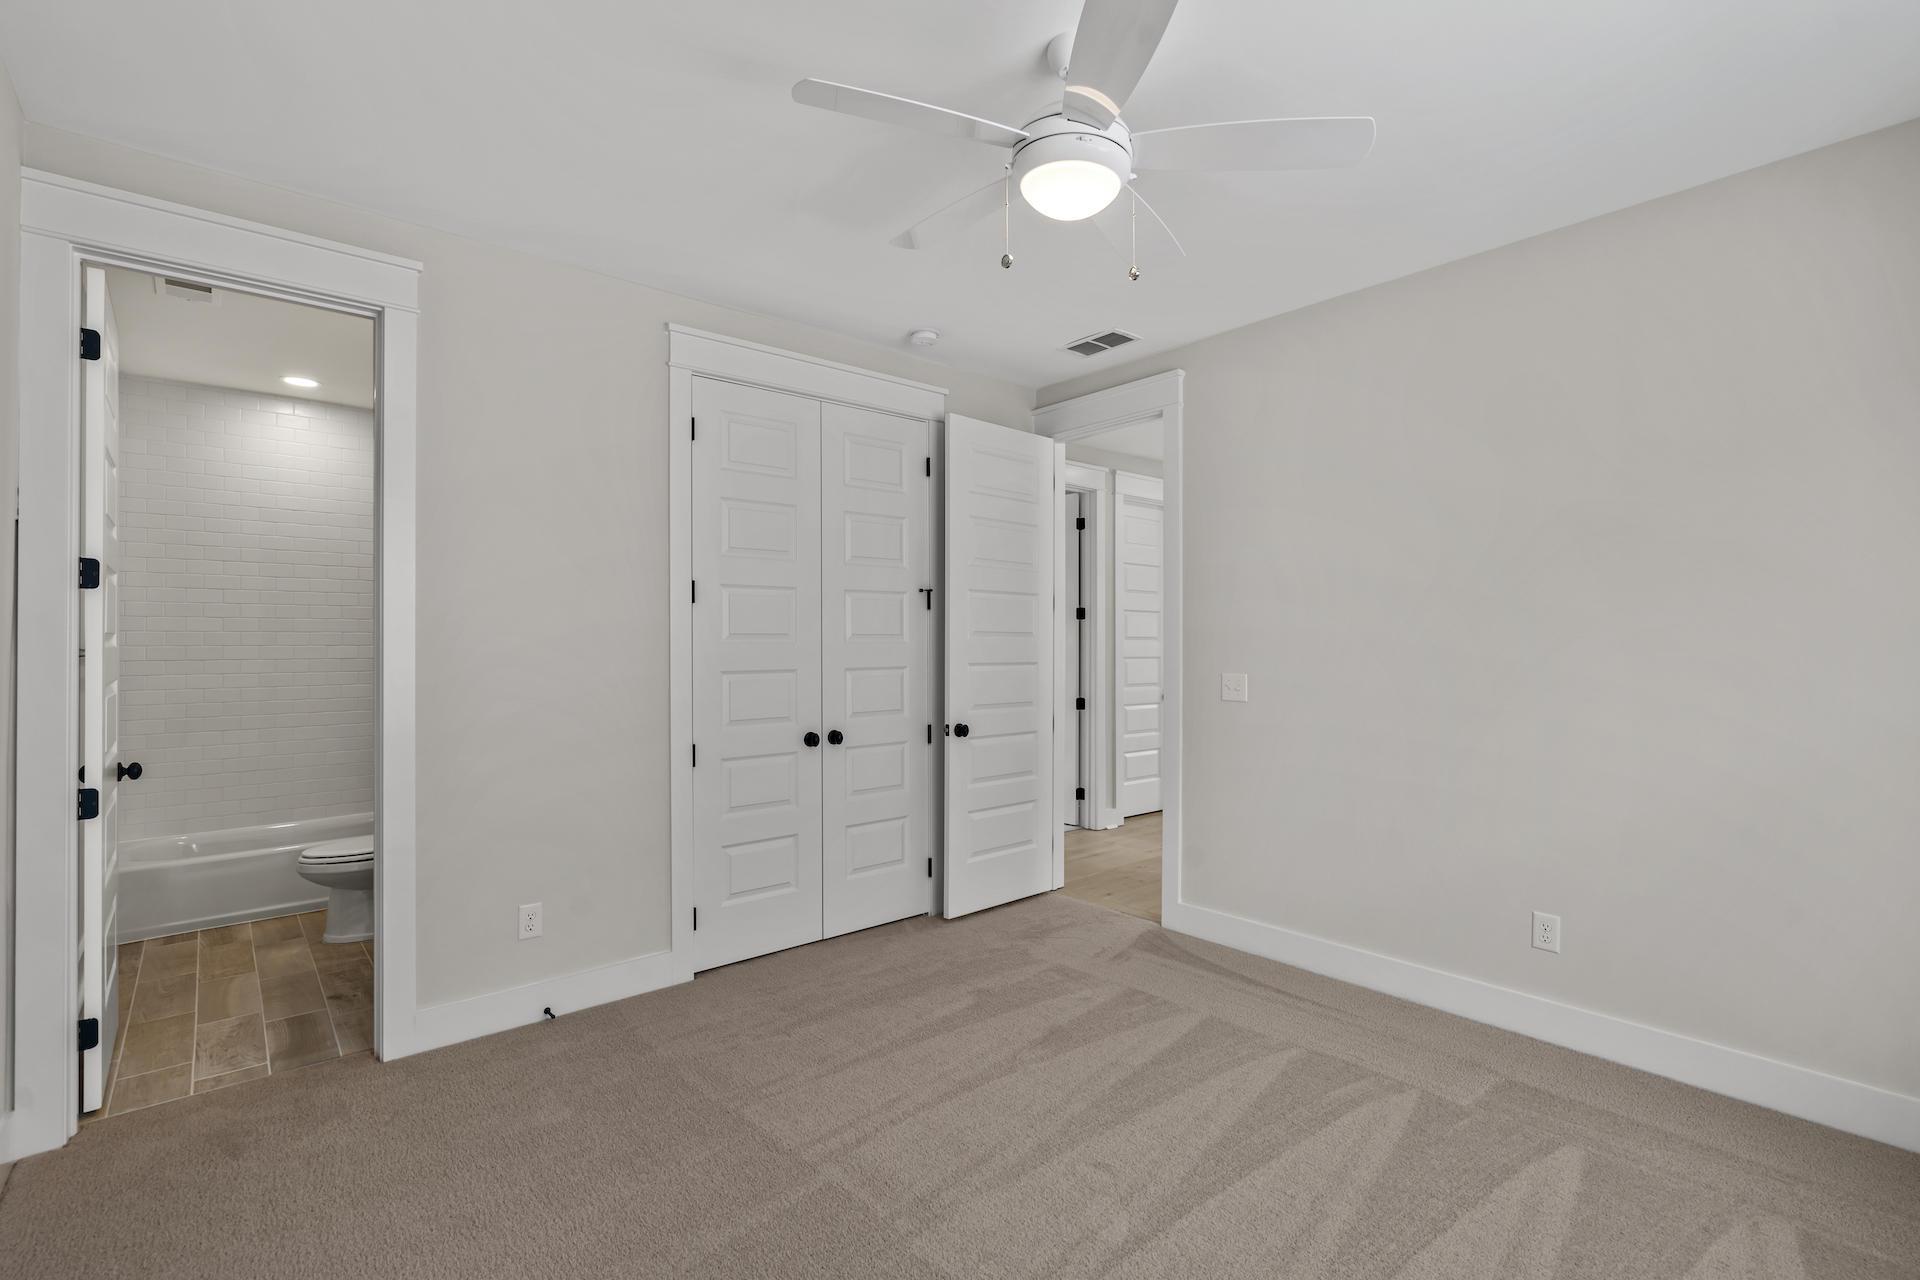 Midtown Homes For Sale - 1320 Upper Union, Mount Pleasant, SC - 6